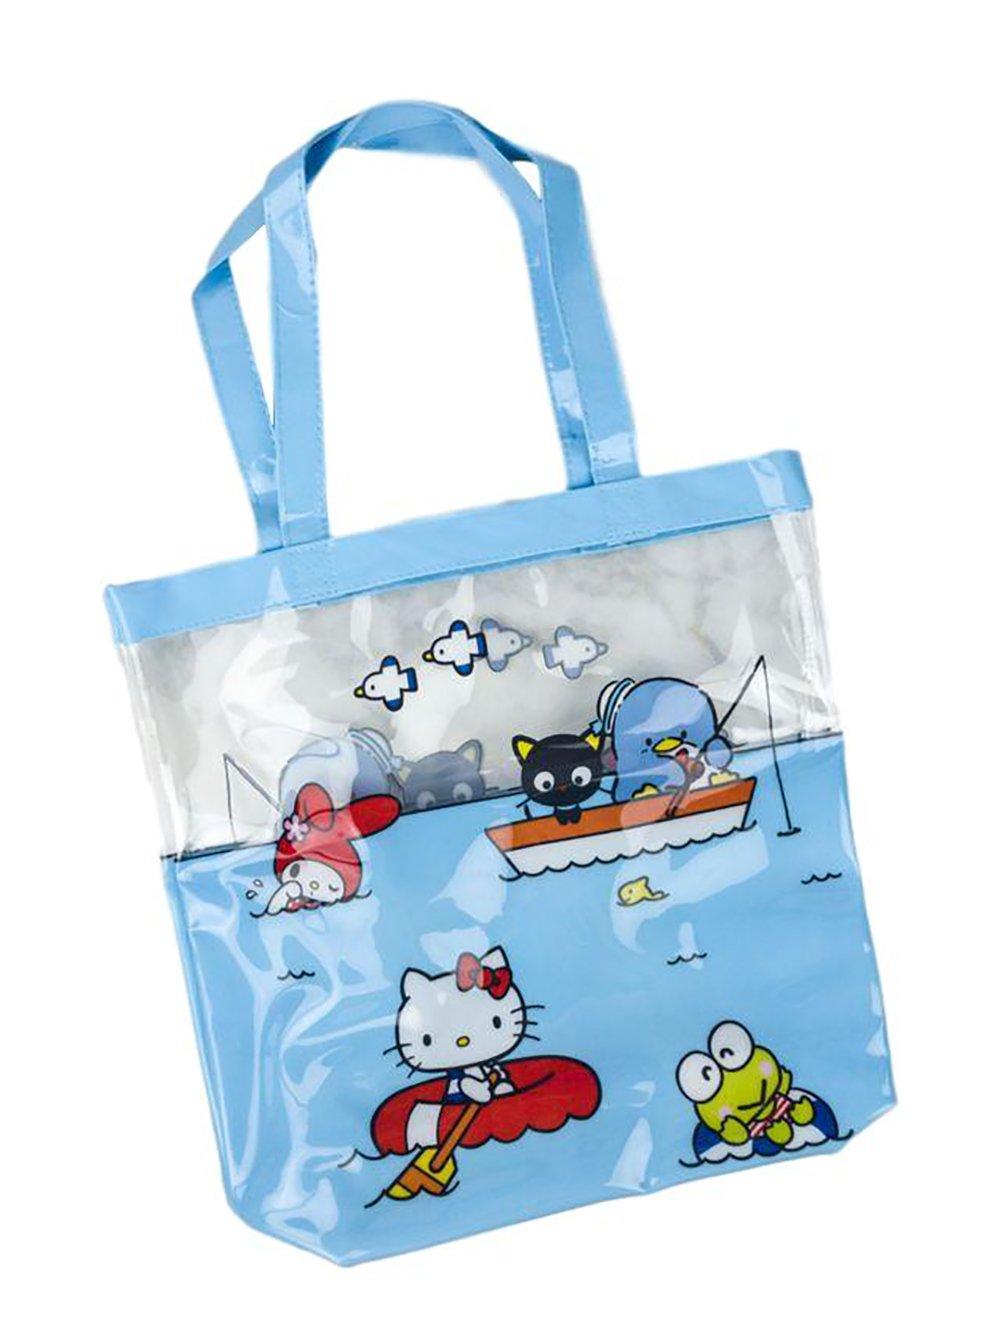 Sanrio Hello Kitty Beach Tote Bag - Loot Crate Exclusive